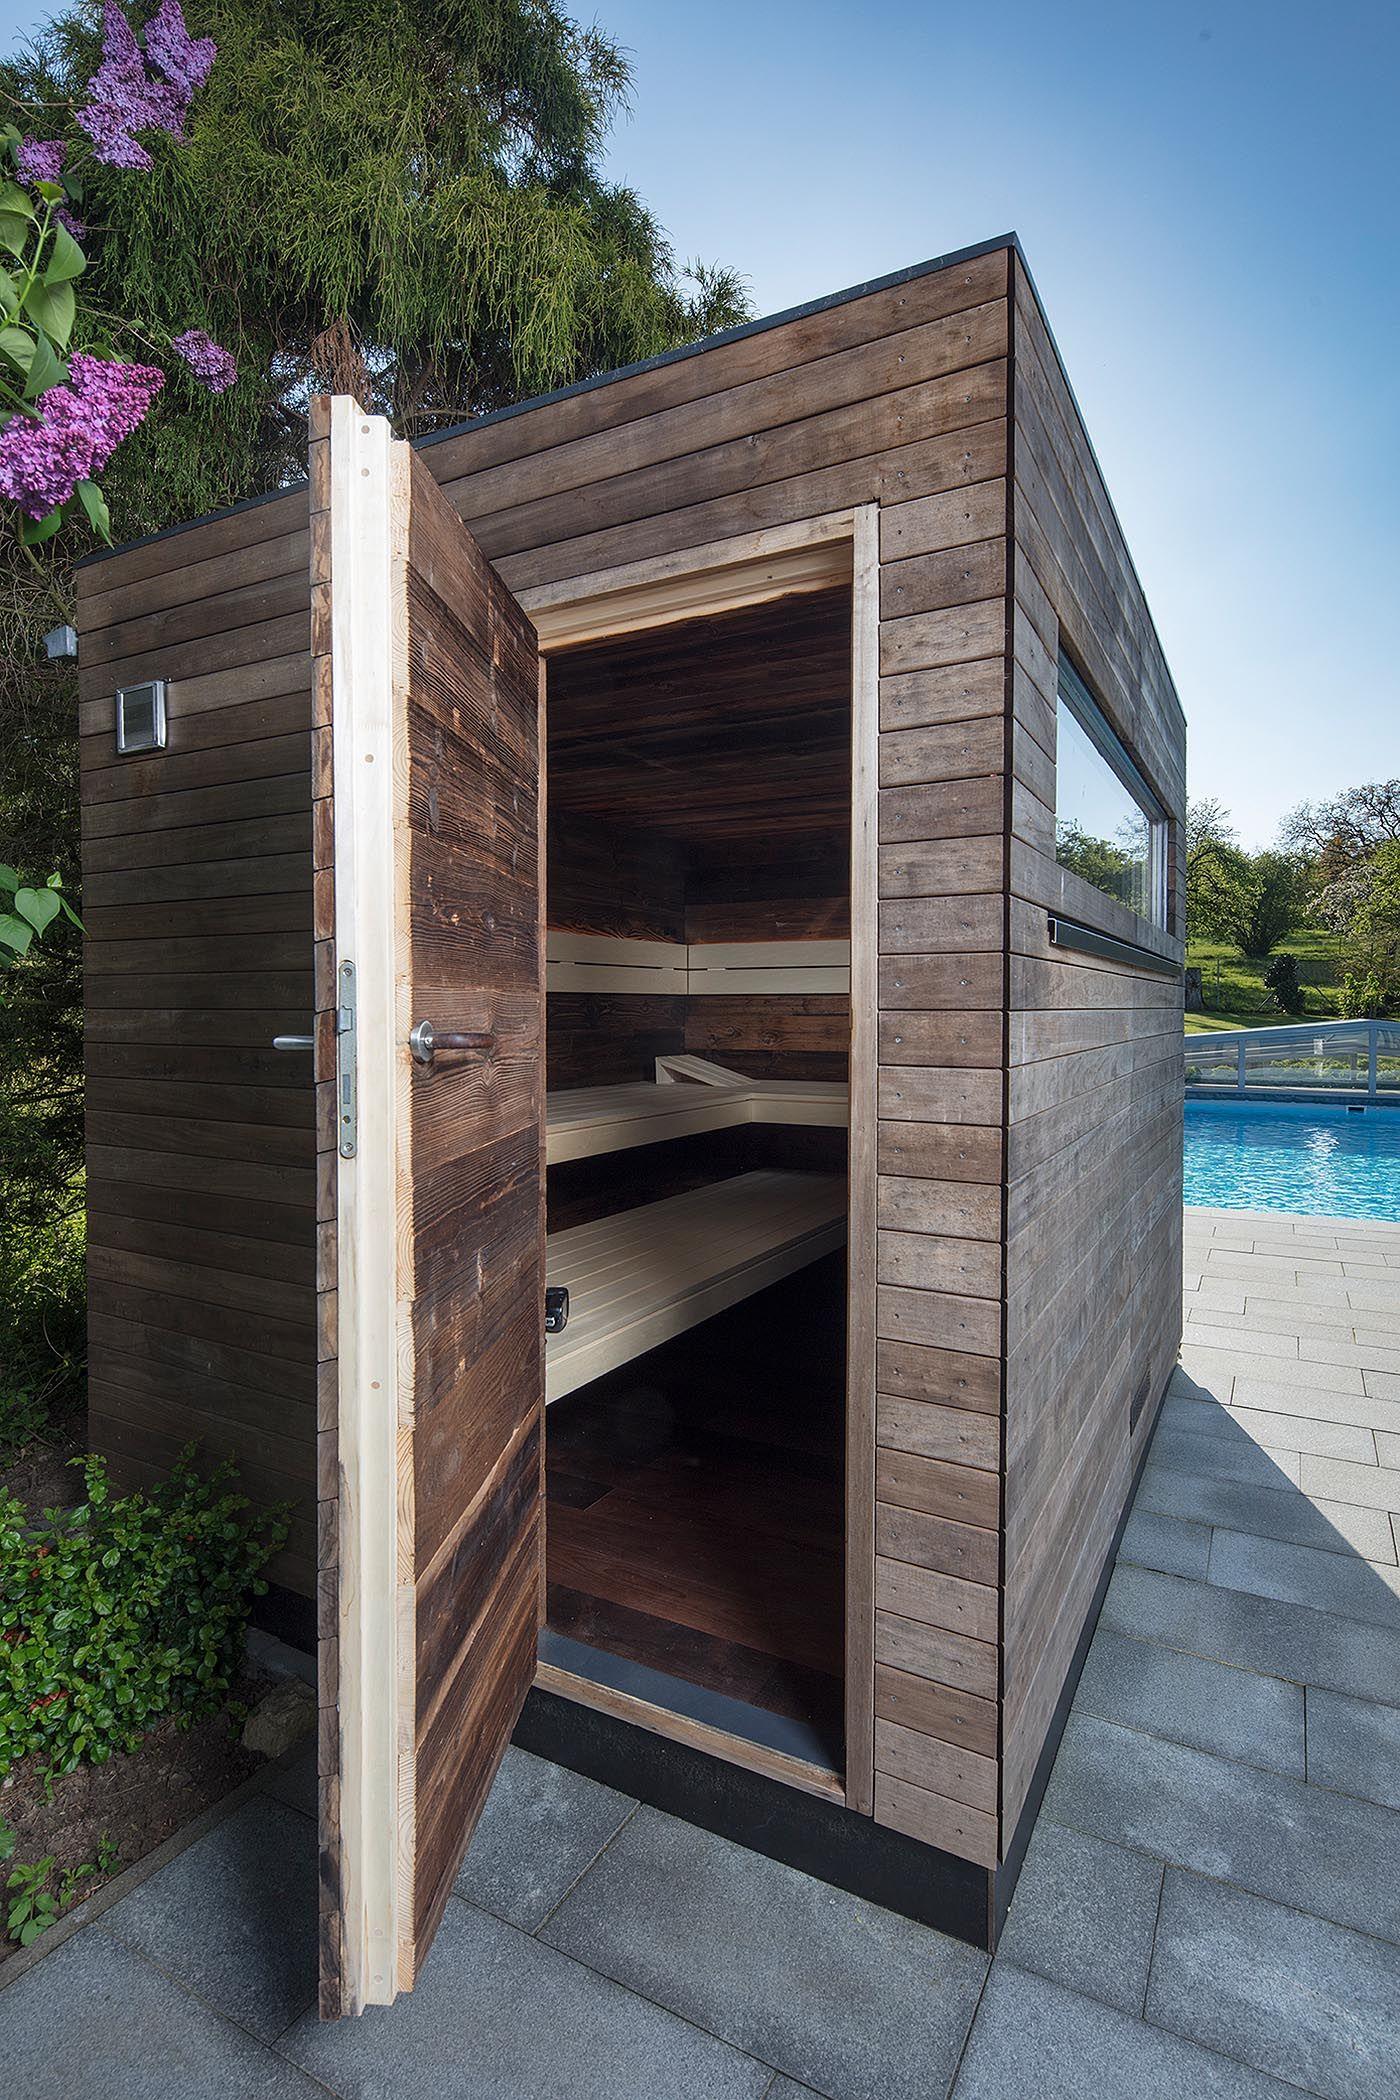 Baugenehmigung Notwendig Fur Die Gartensauna Corso Sauna Gartensauna Sauna Im Garten Saunahaus Garten